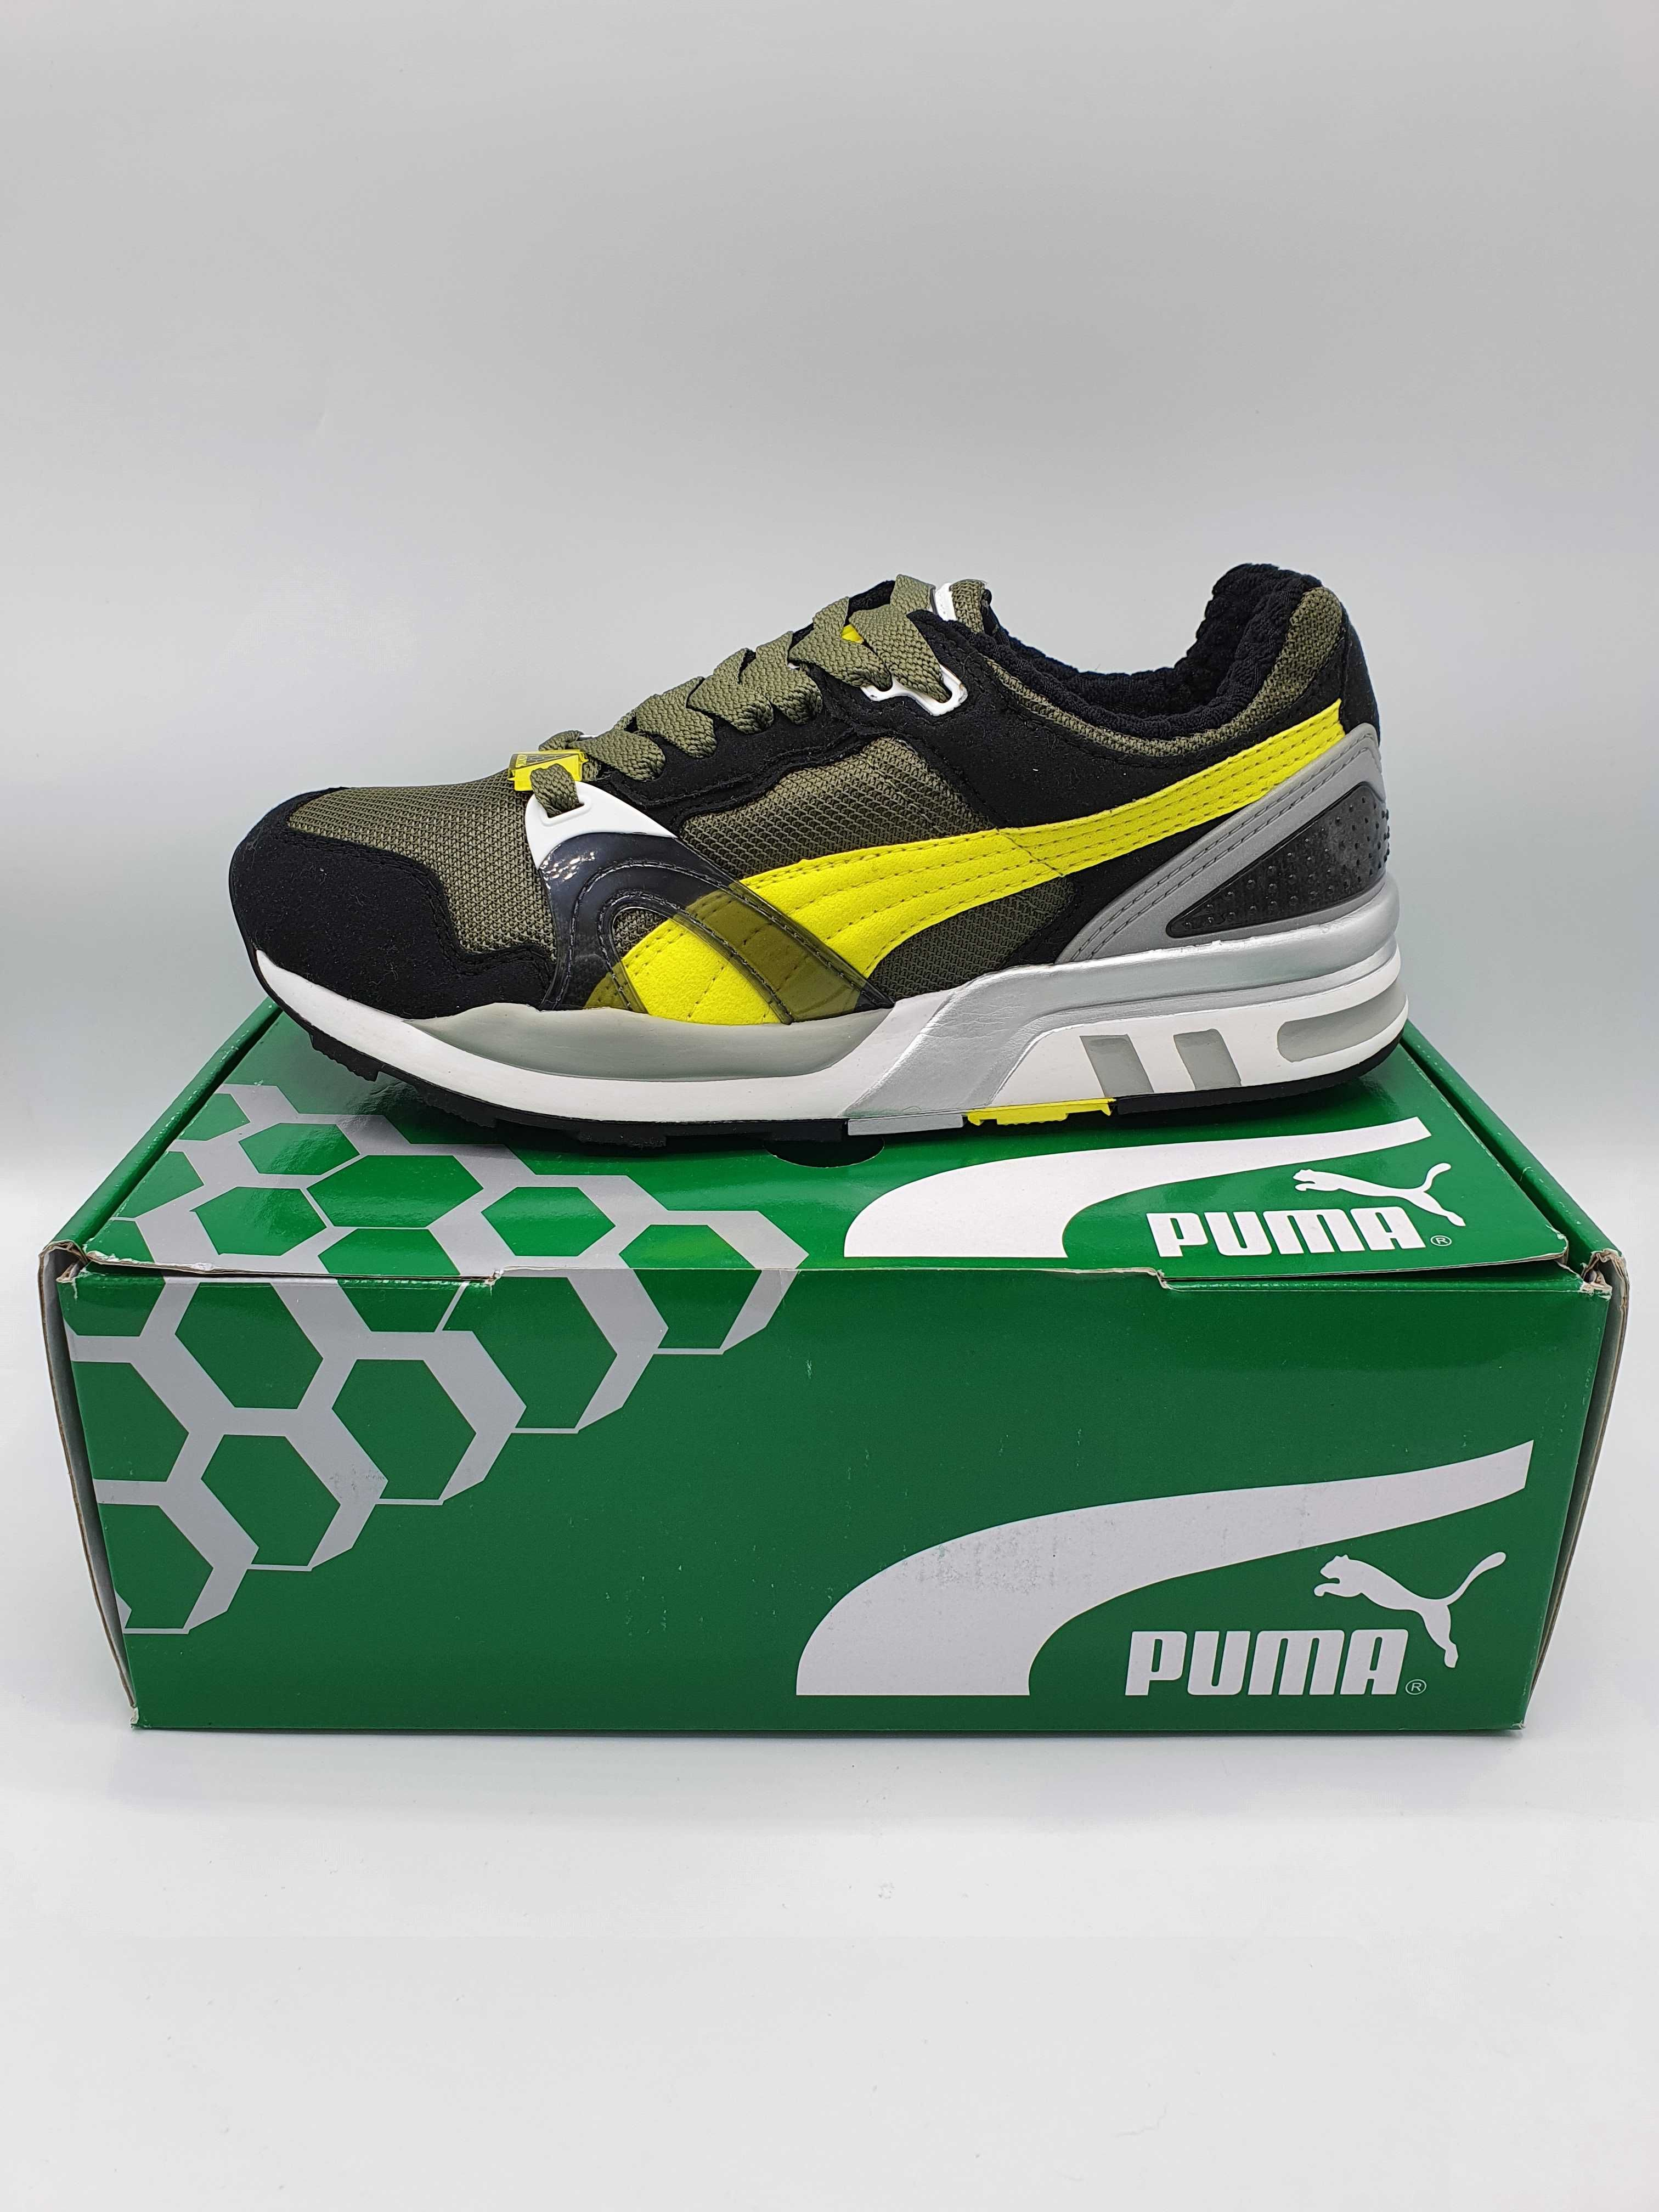 Adidasi Puma Trinomic XT2 Plus